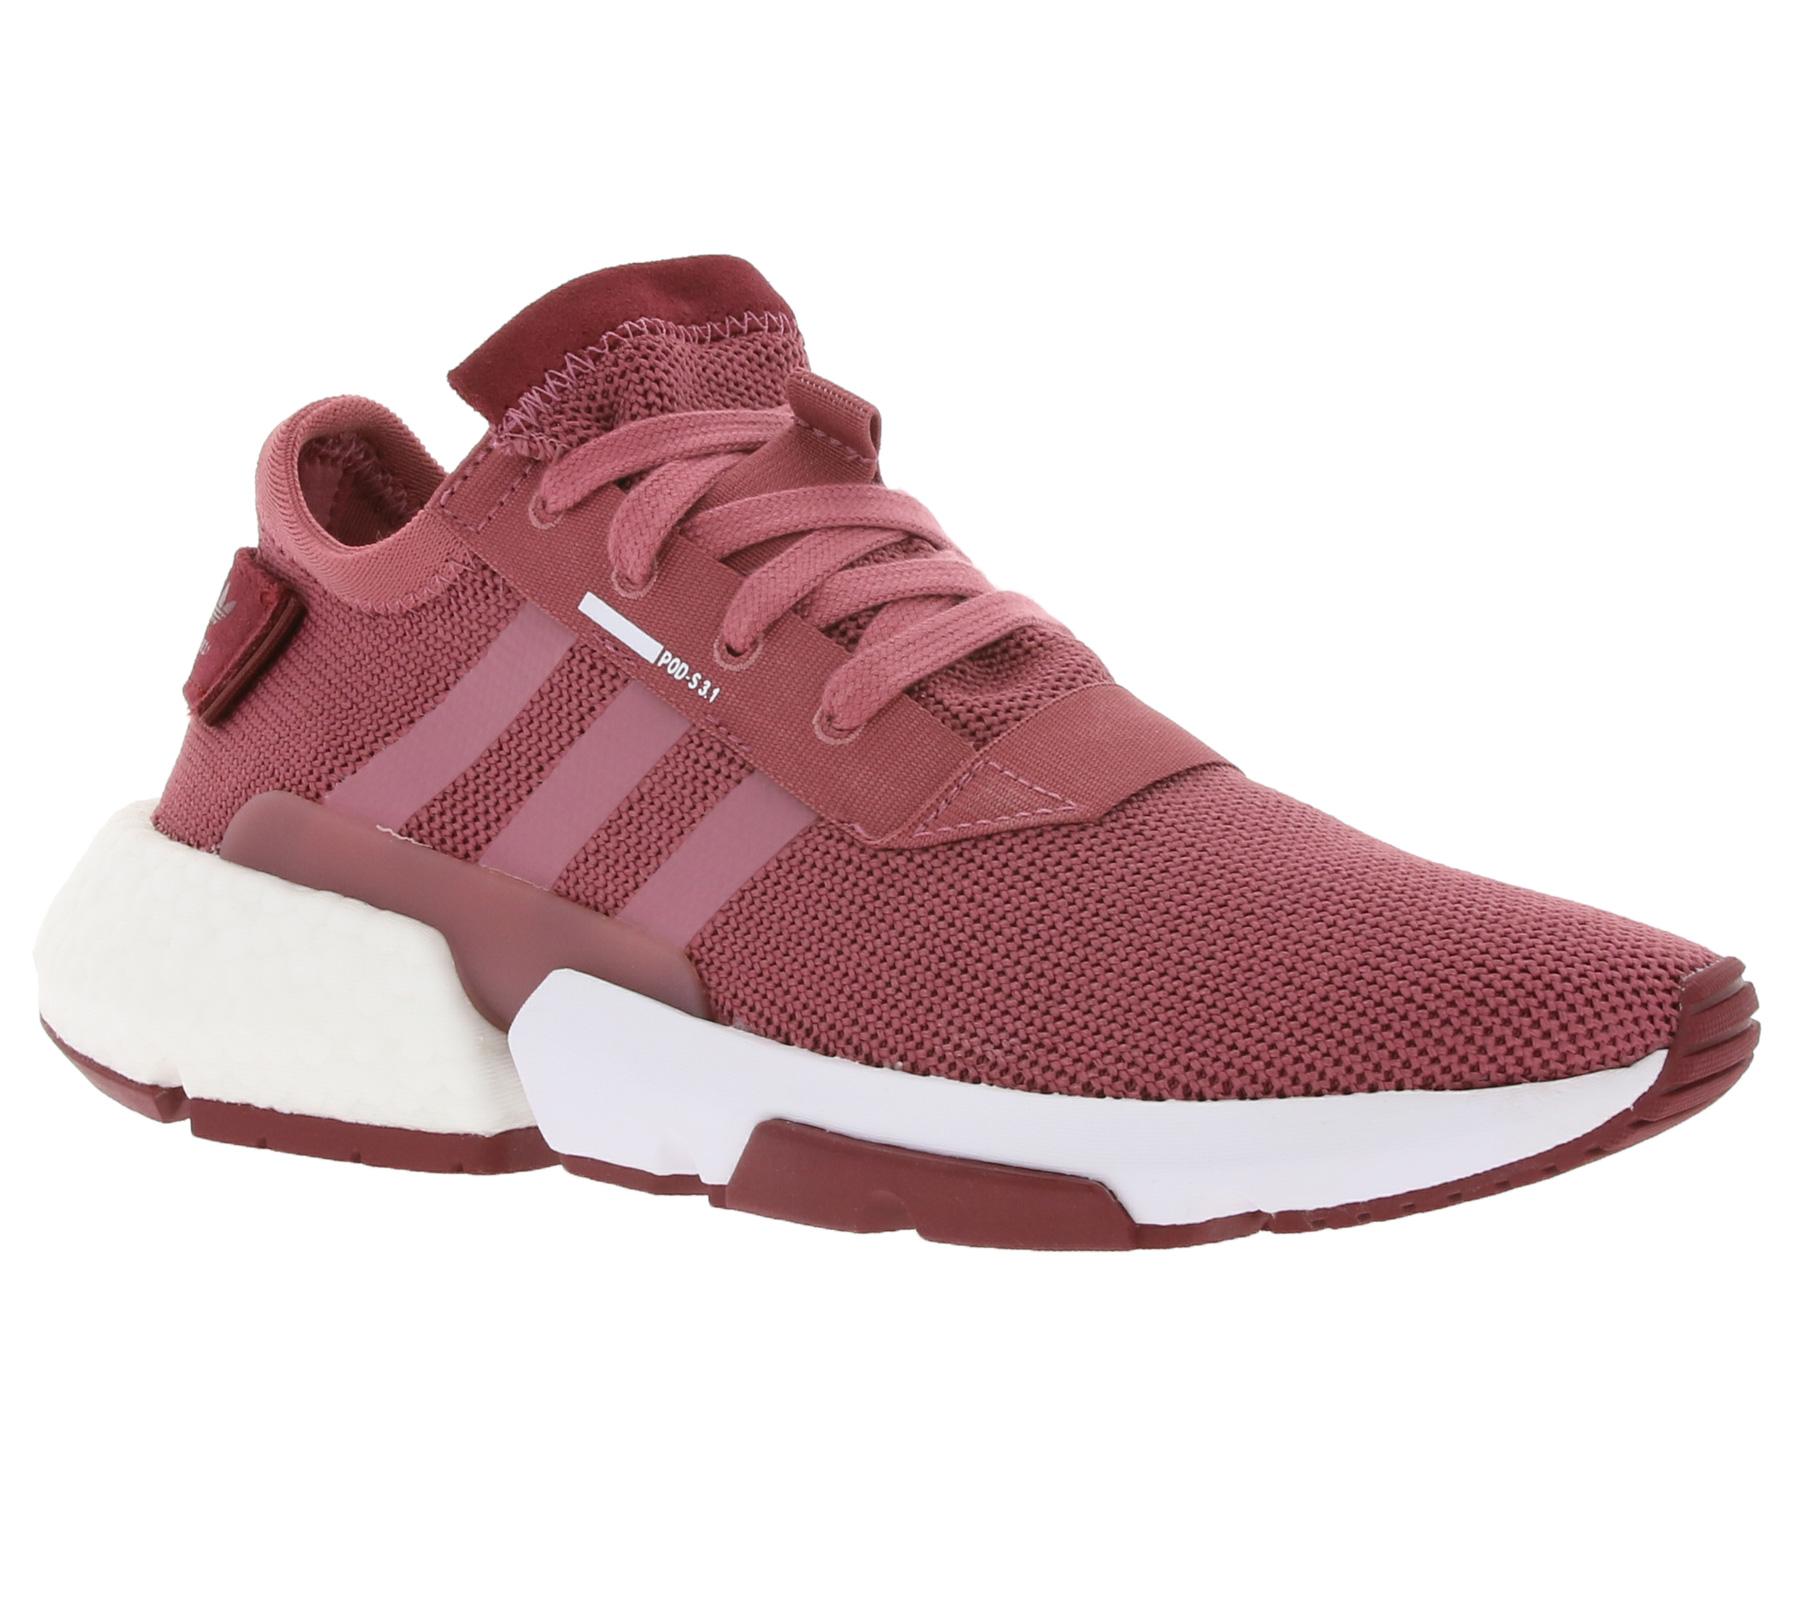 Details zu adidas Originals Sneaker Turnschuhe sportliche Damen Schuhe POD S3.1 W Bordeaux